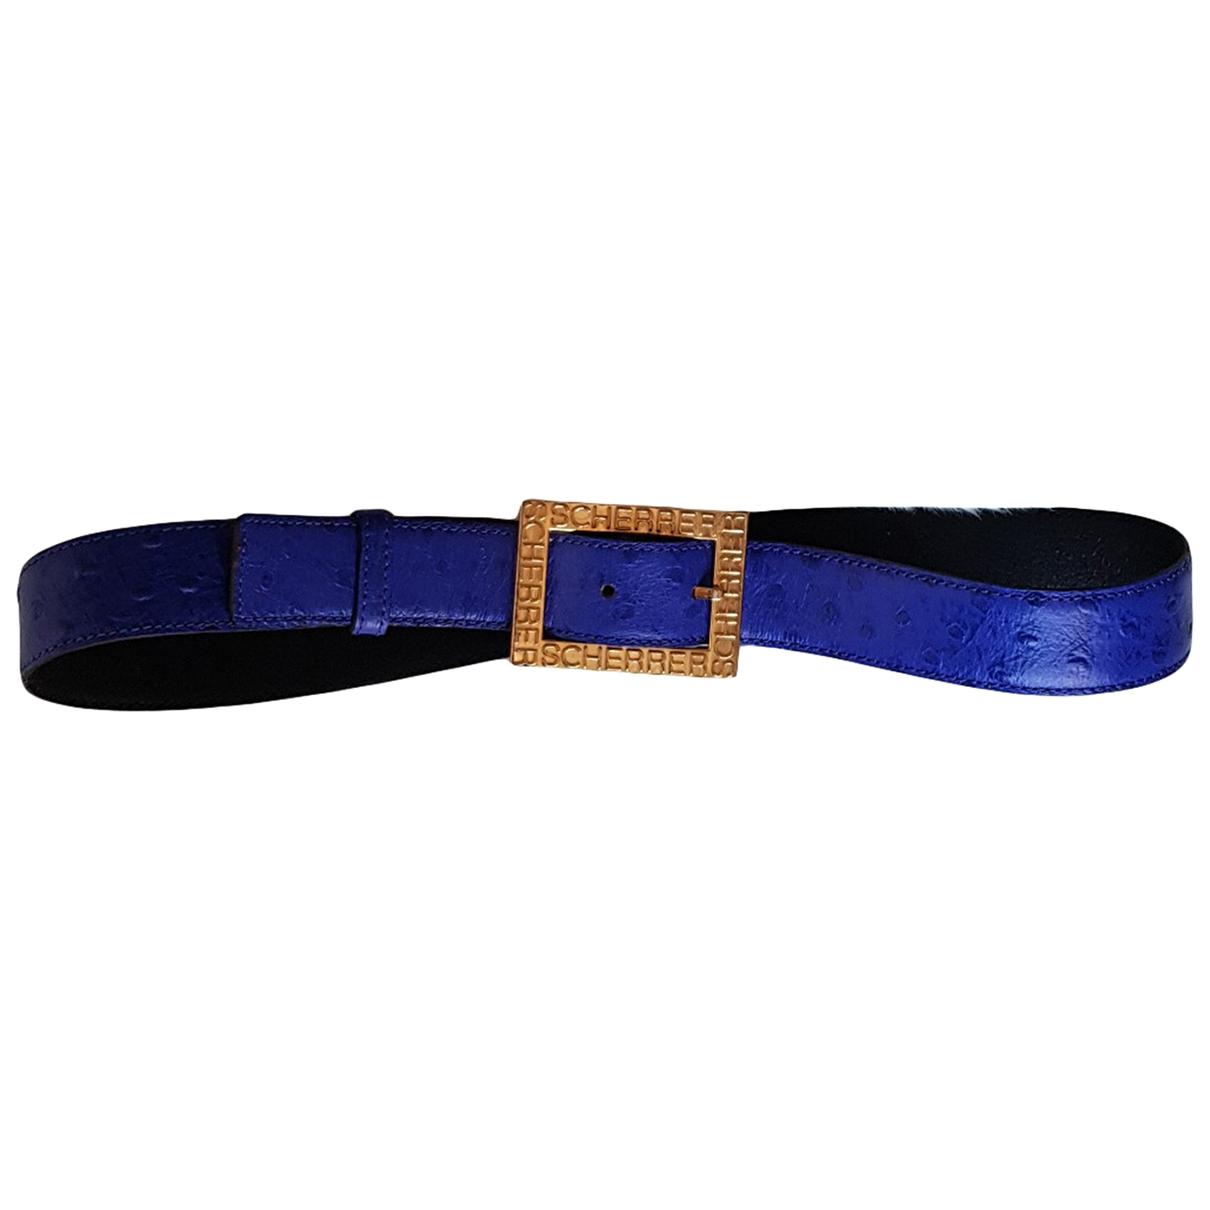 Cinturon de Cuero Jean-louis Scherrer